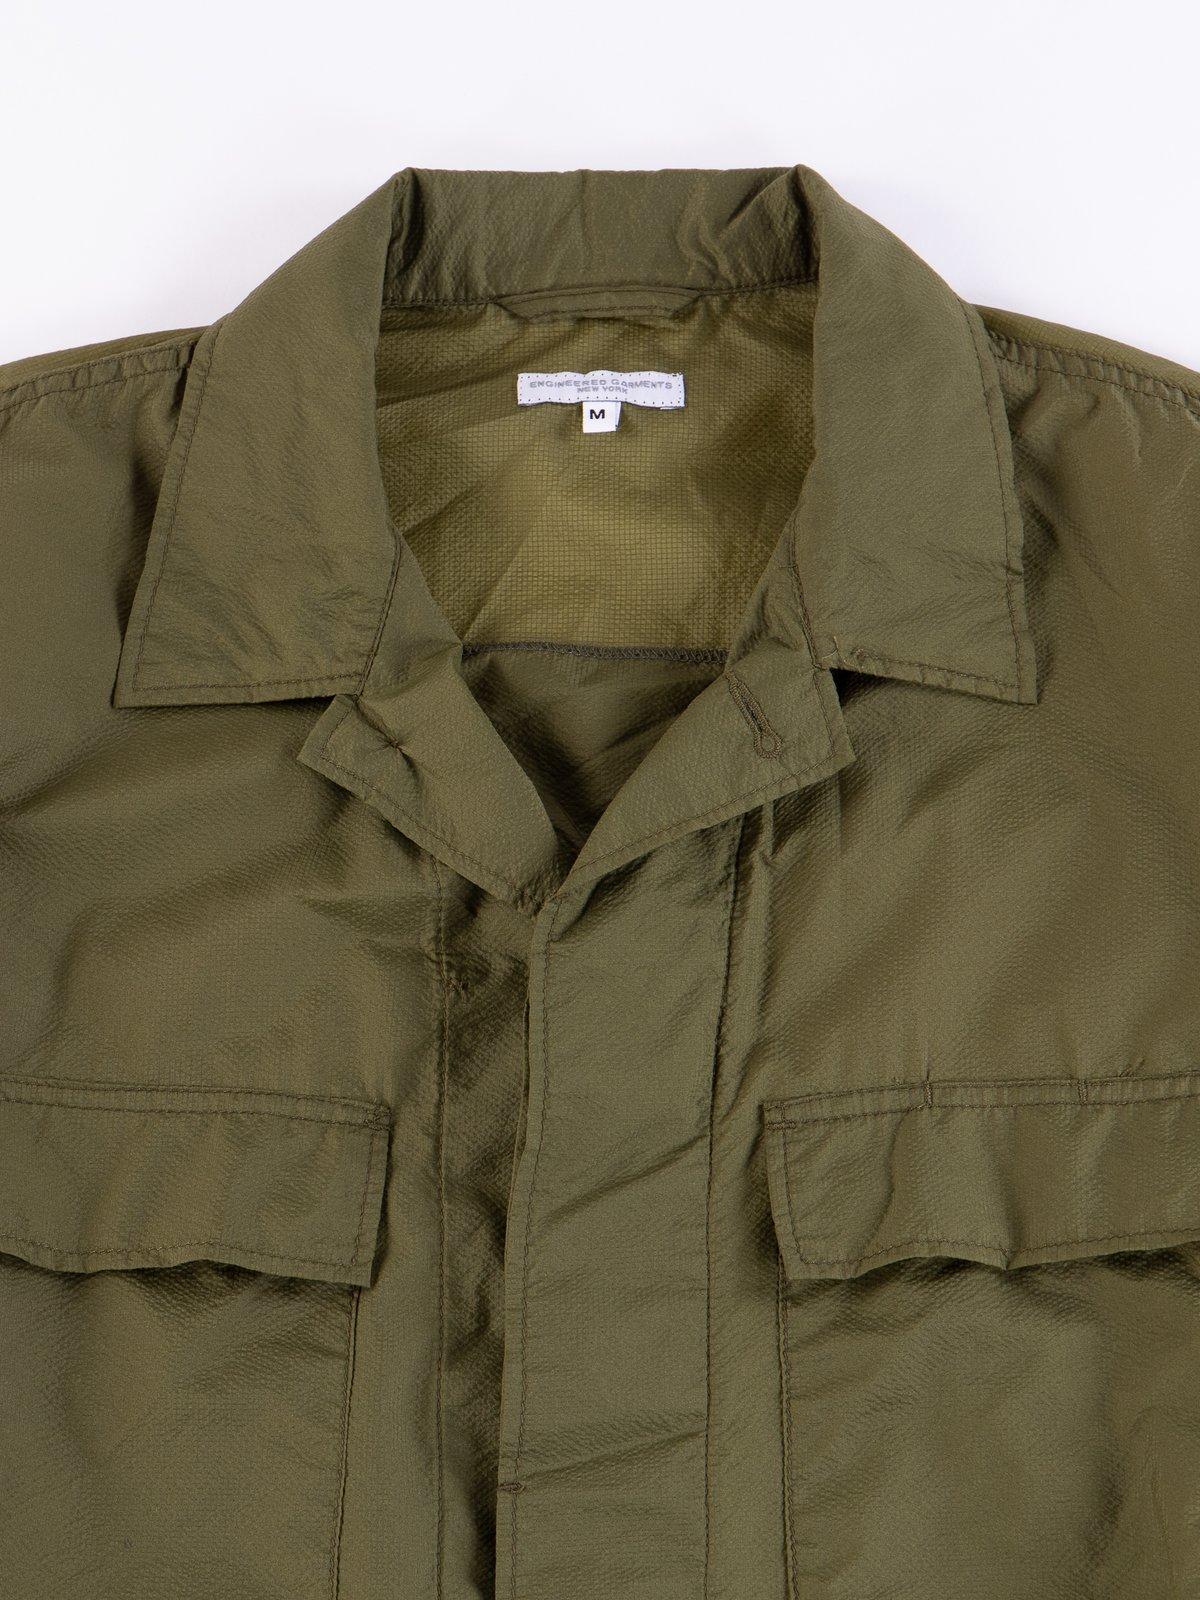 Olive Nylon Micro Ripstop BDU Jacket - Image 3